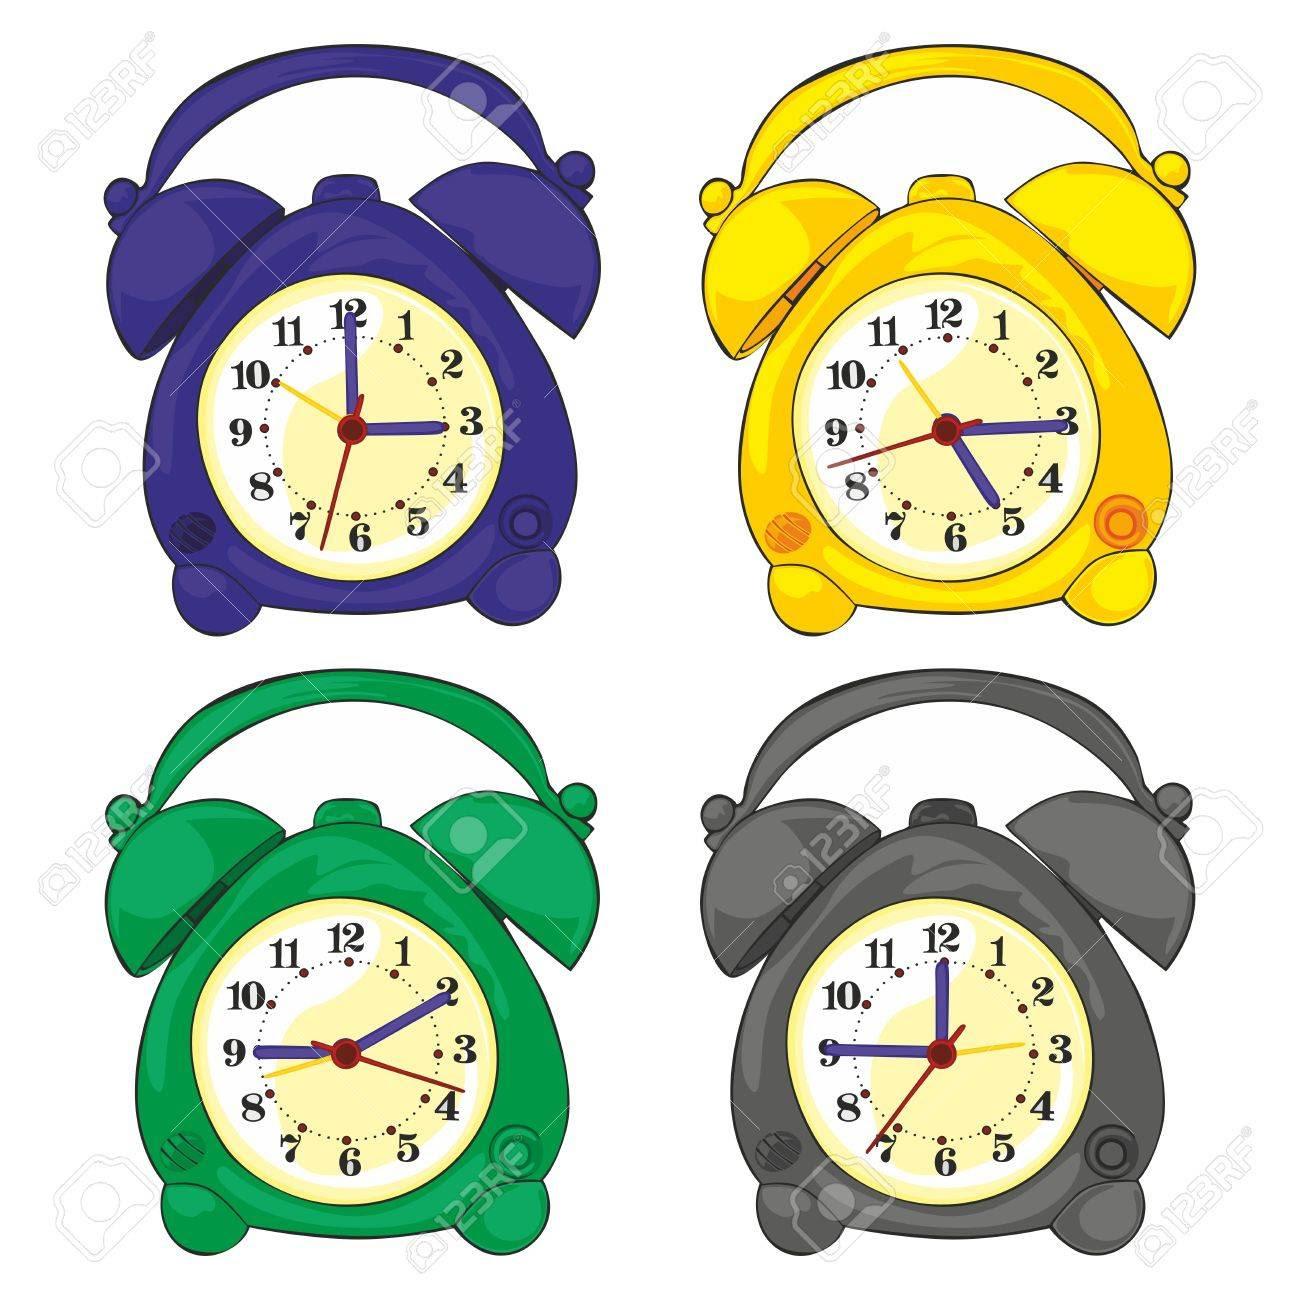 Fully Editable Illustration Of Isolated Clocks Royalty Free ...